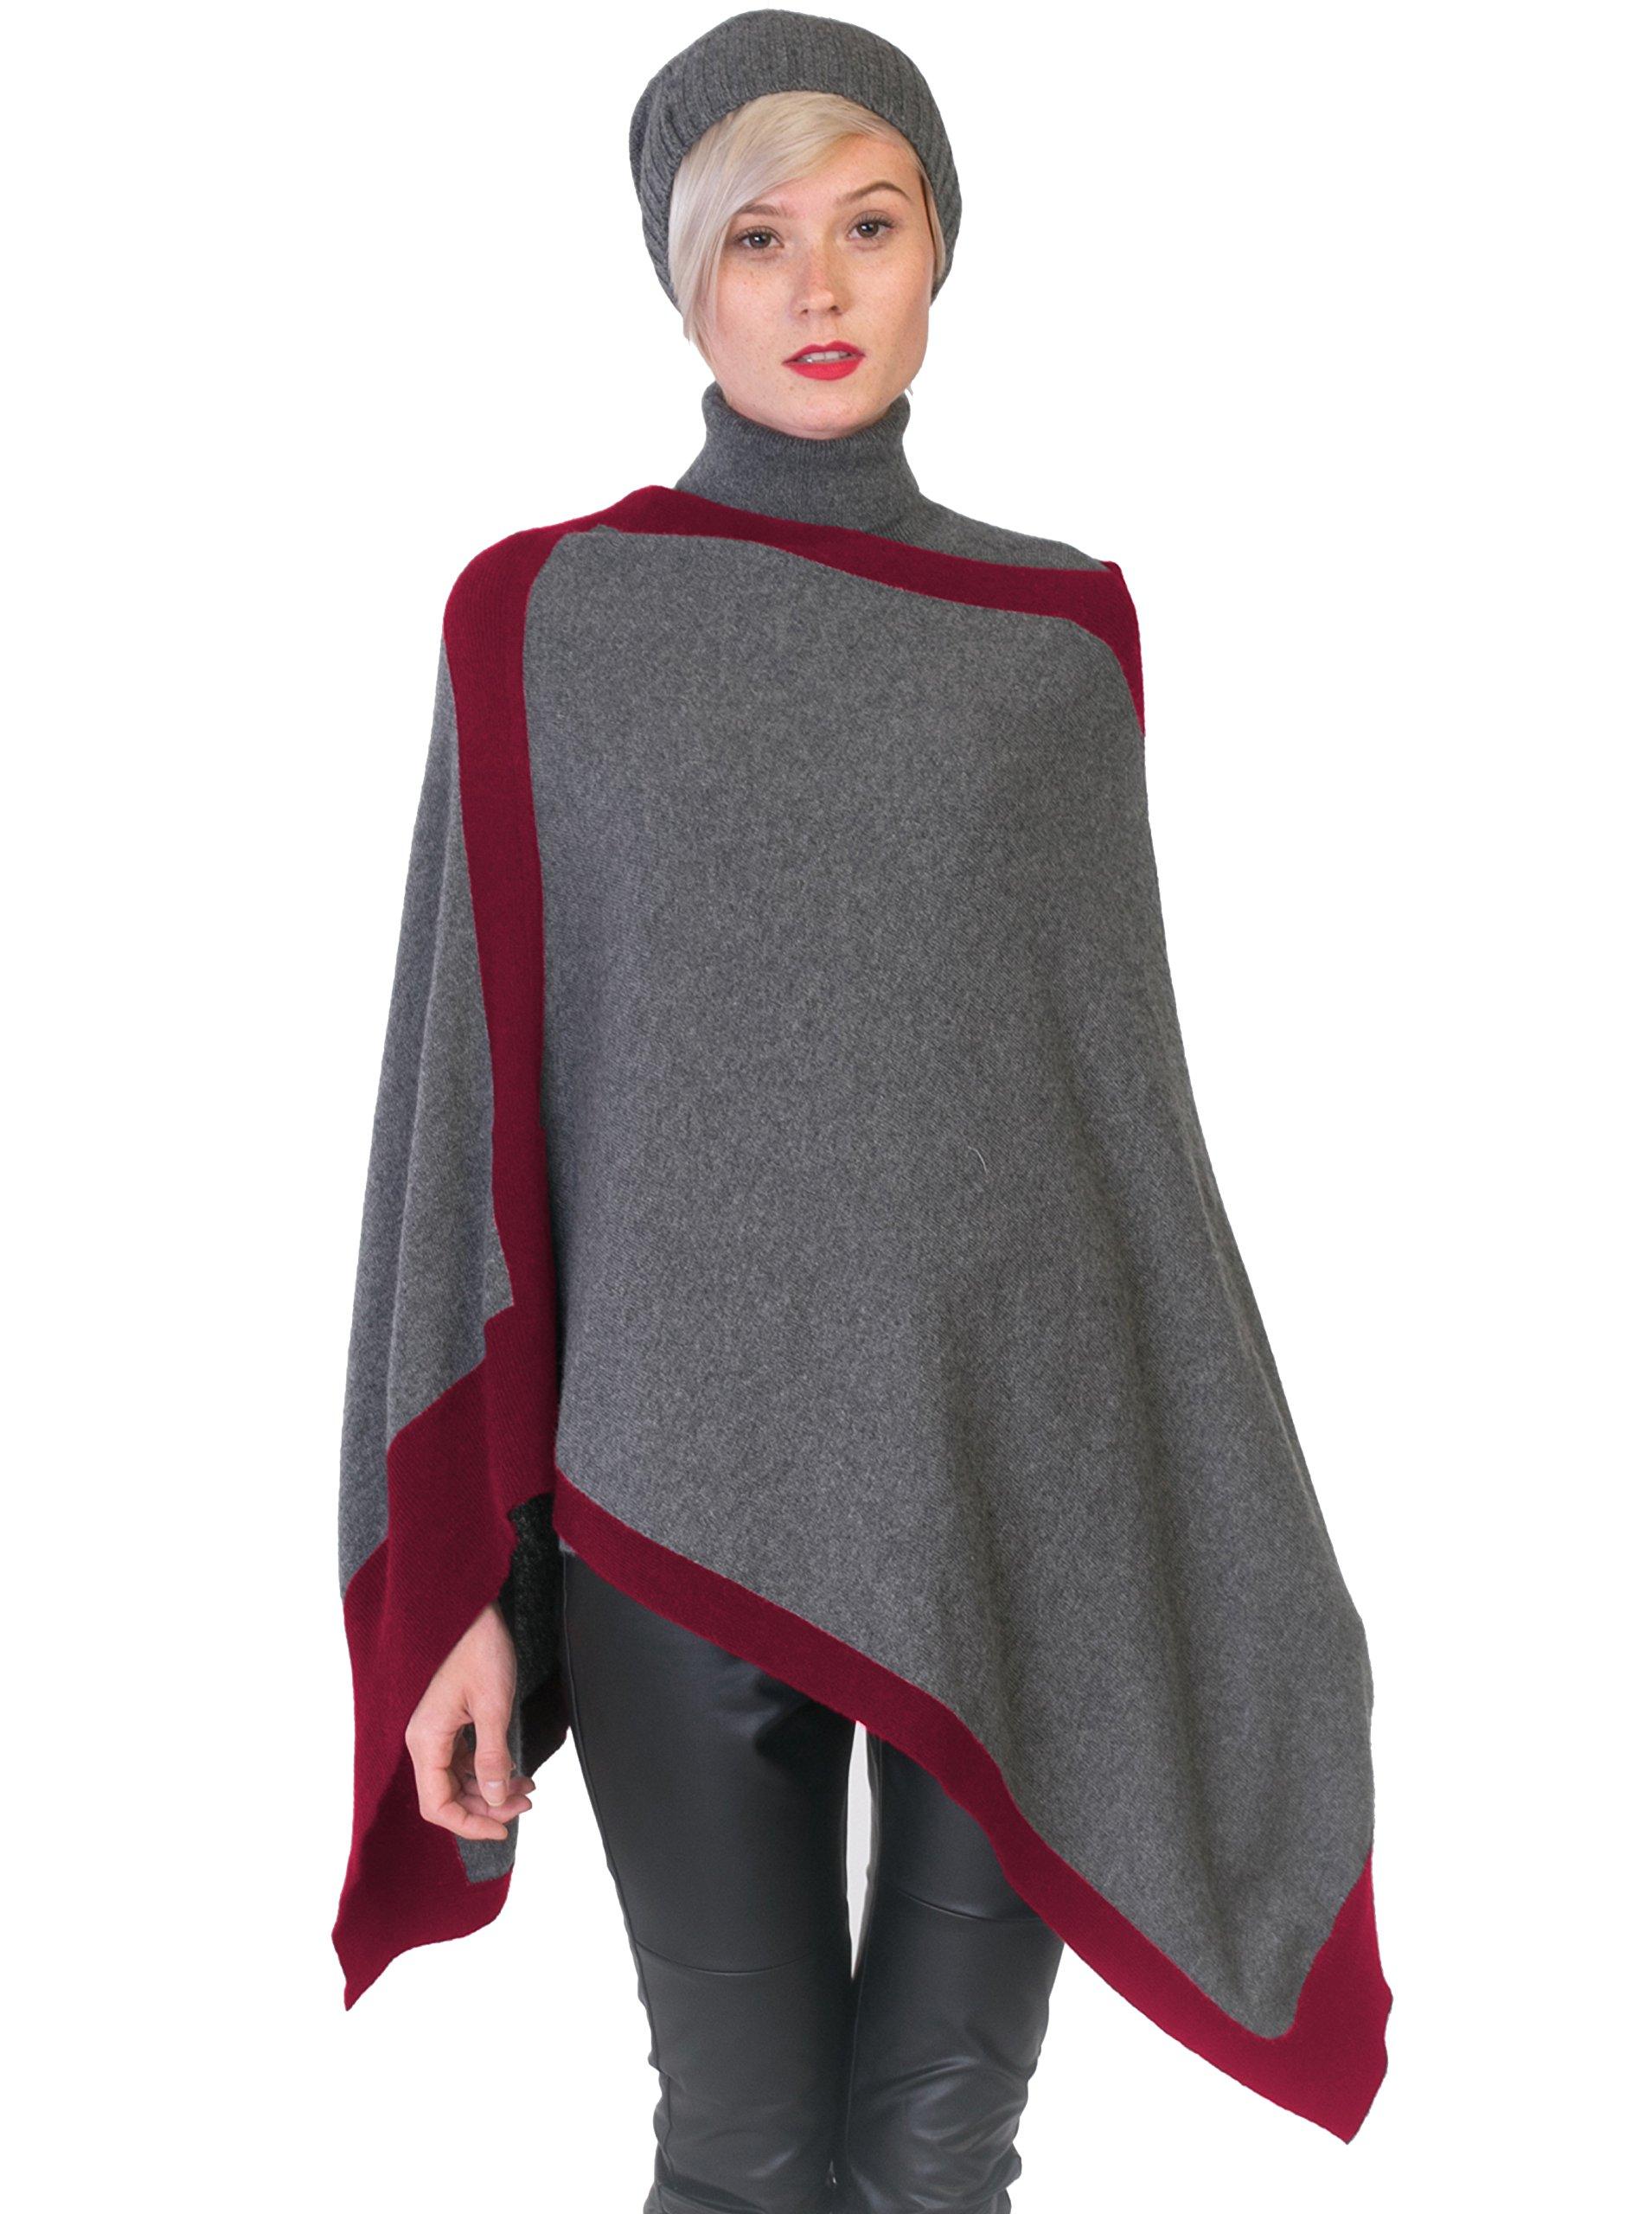 cashmere 4 U 100% Cashmere Poncho Asymmetrical Boat Neck Wraps For Women by cashmere 4 U (Image #1)